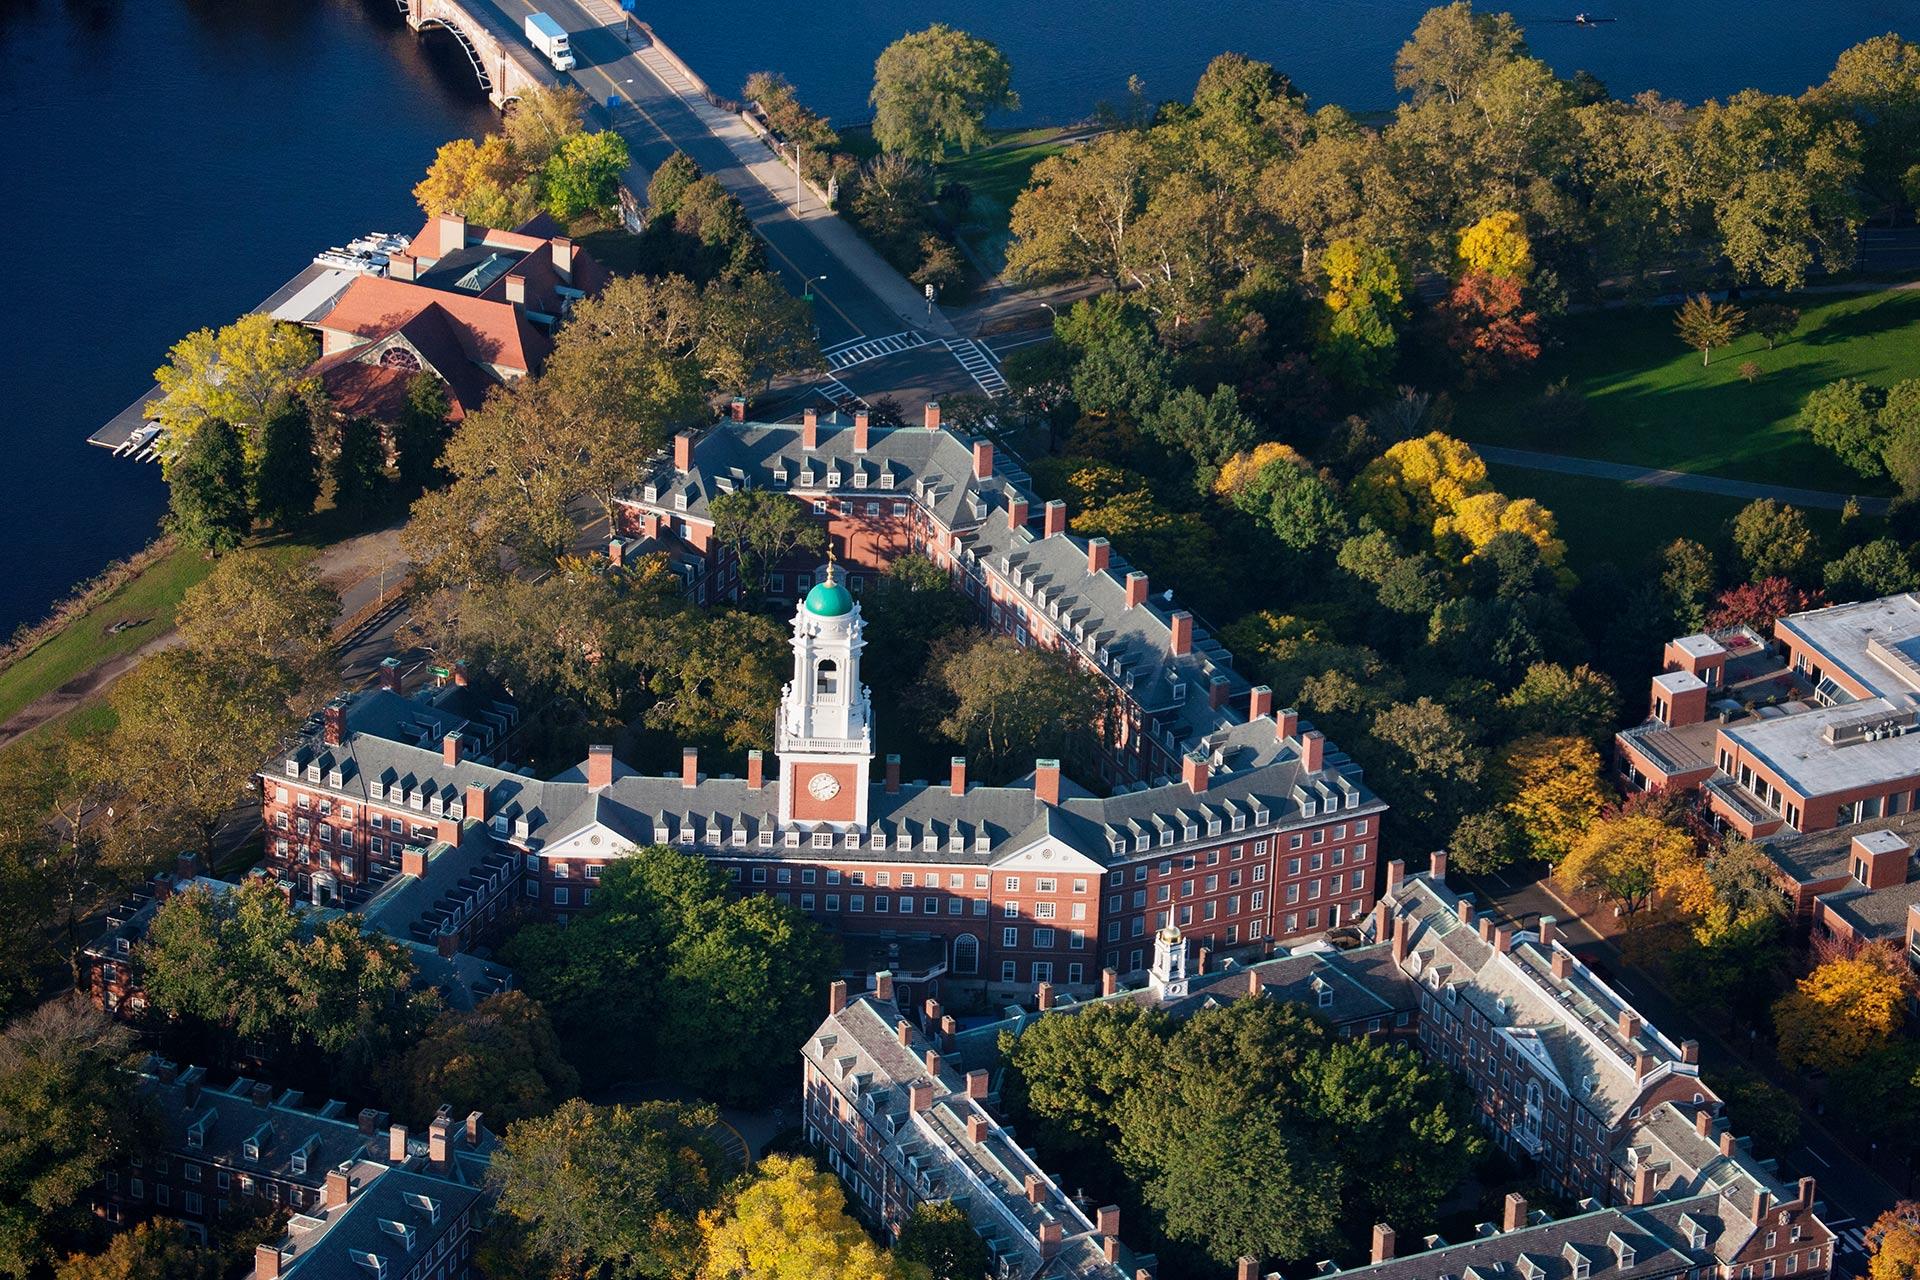 An aerial shot of Harvard's campus; Photo Courtesy of Joseph Sohm/Shutterstock.com